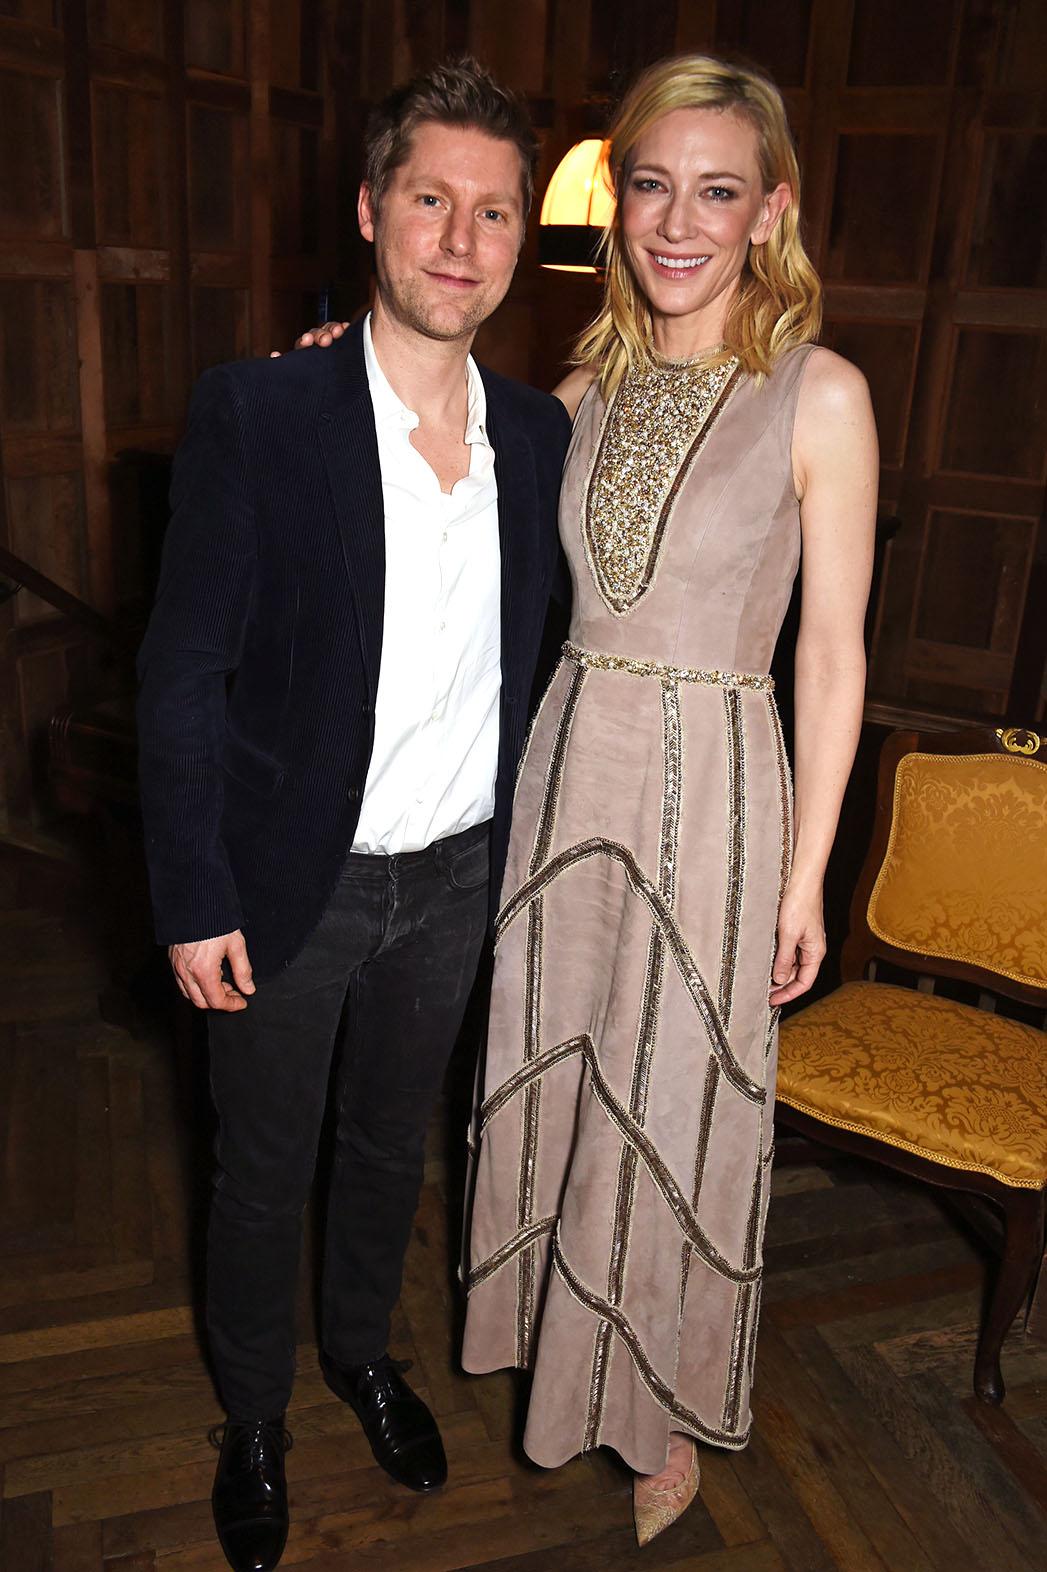 Christopher Bailey Cate Blanchett Harvey Weinstein's pre-BAFTA Dinner Burberry - H 2016